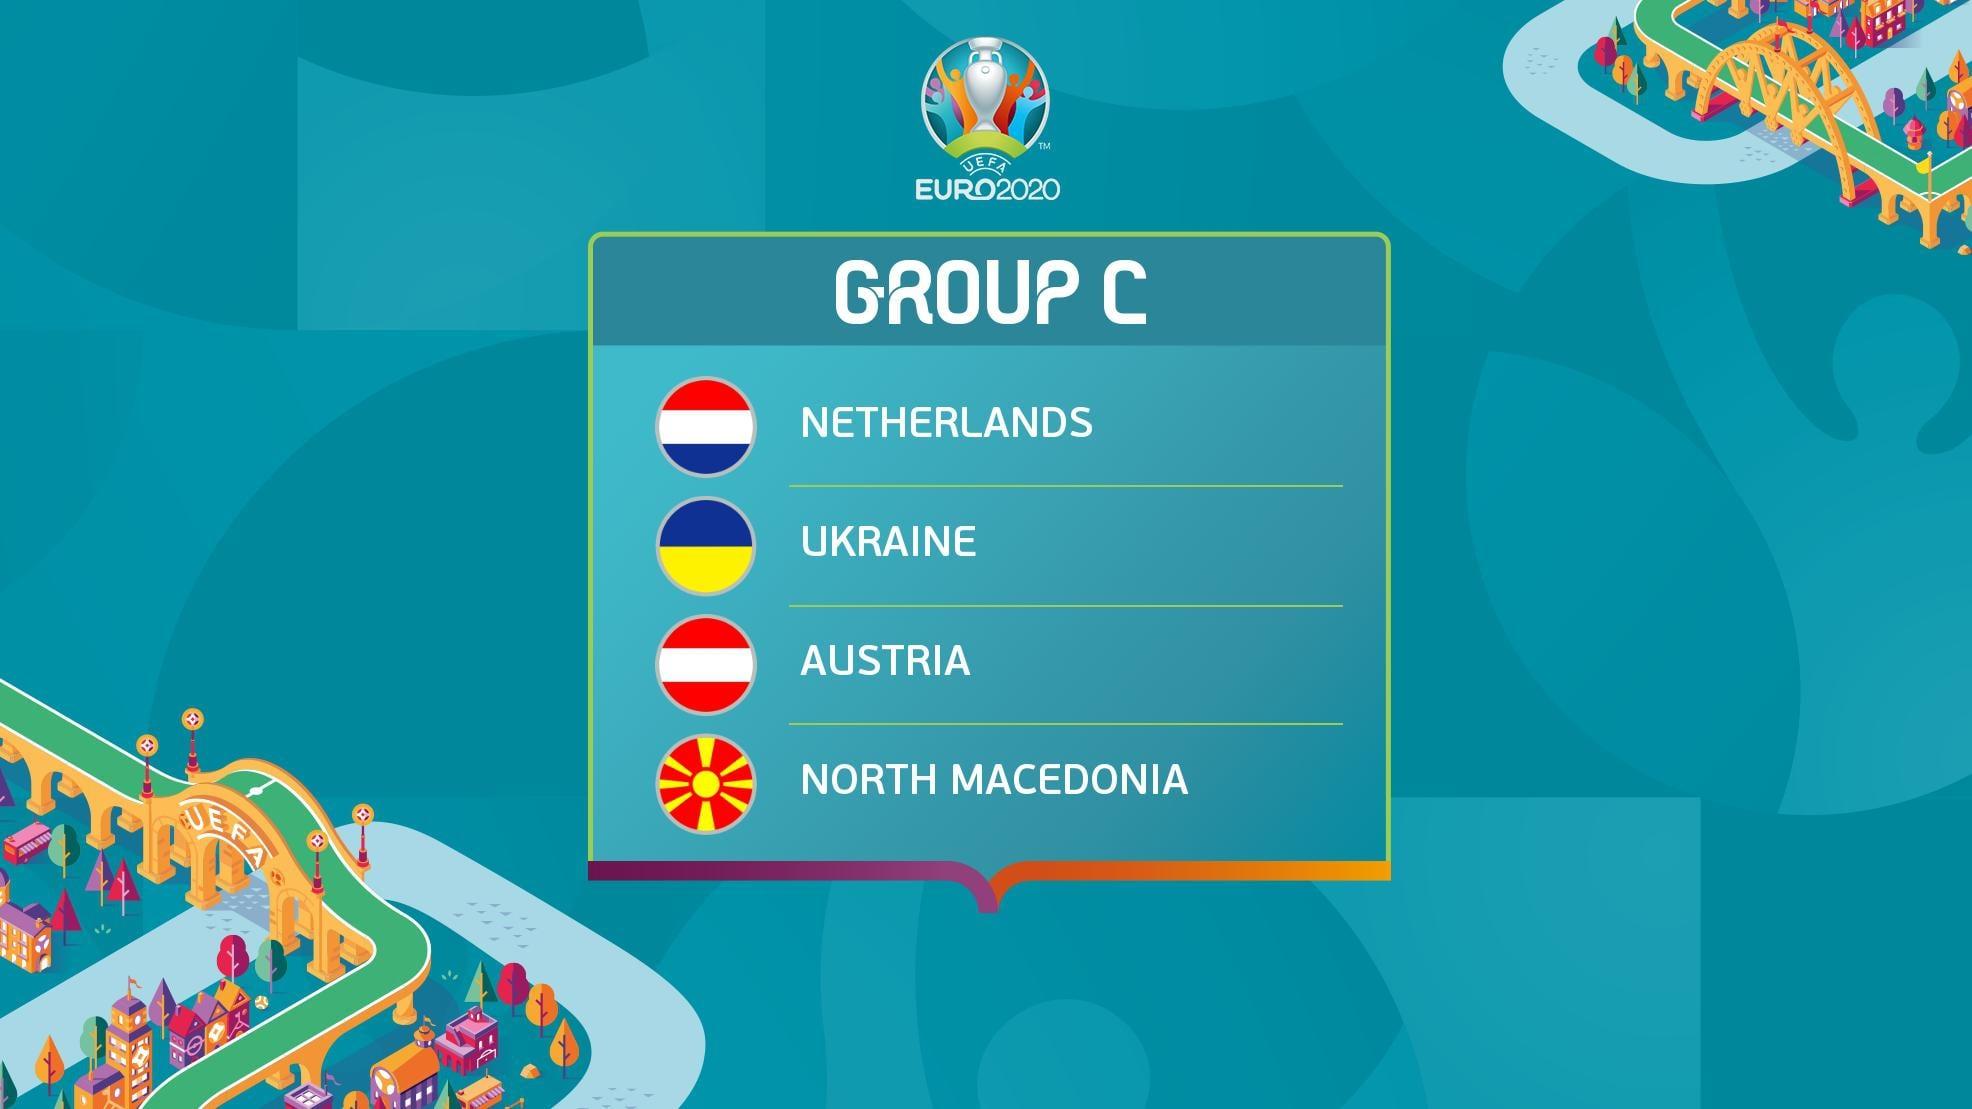 EURO 2020 - Group C Groupc